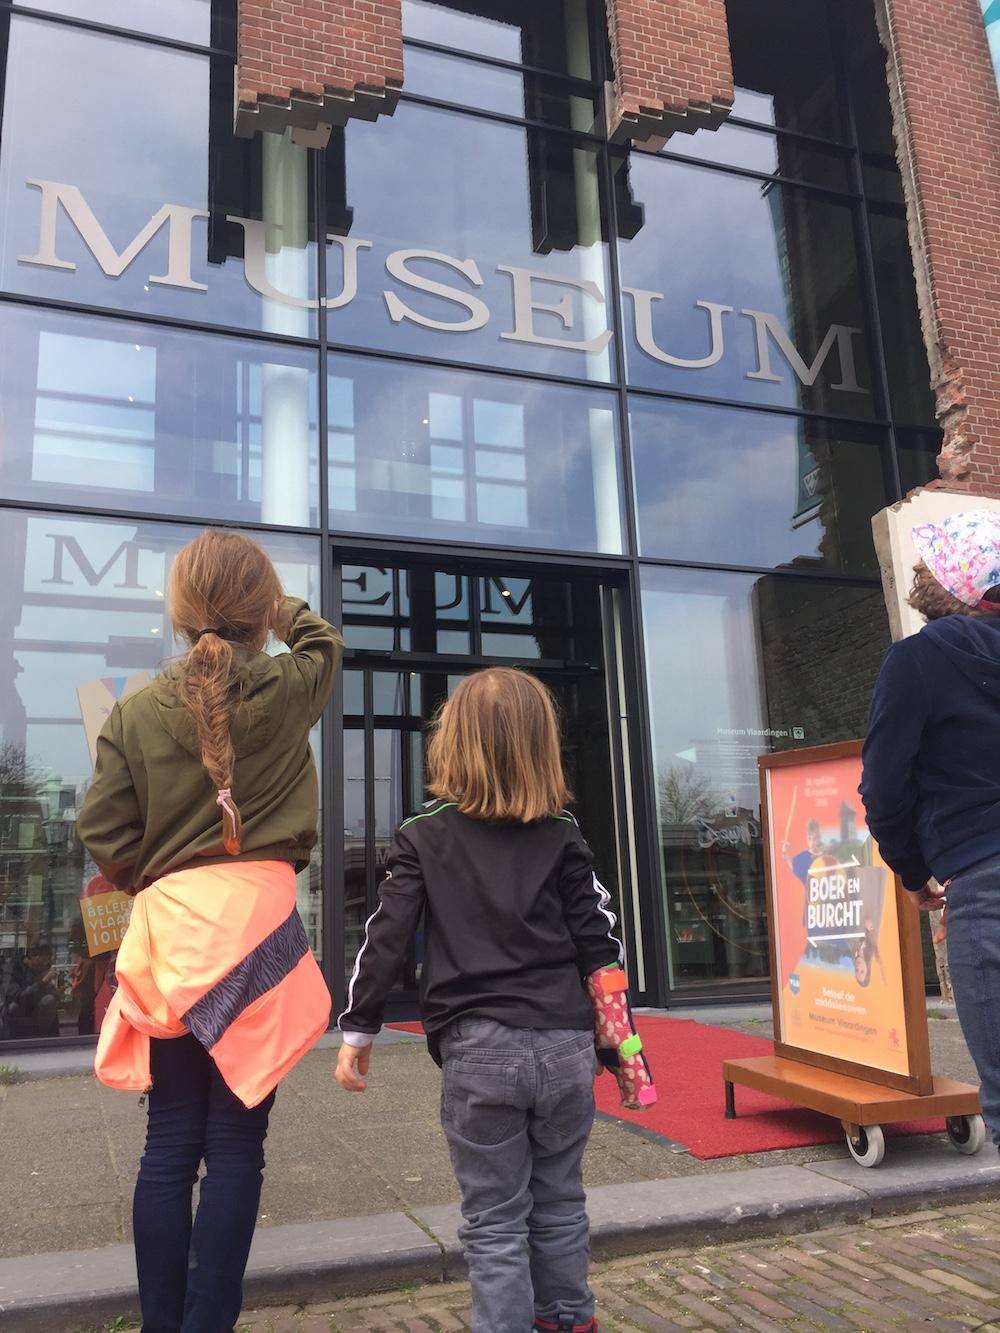 familietentoonstelling Boer en Burcht in Museum Vlaardingen 01